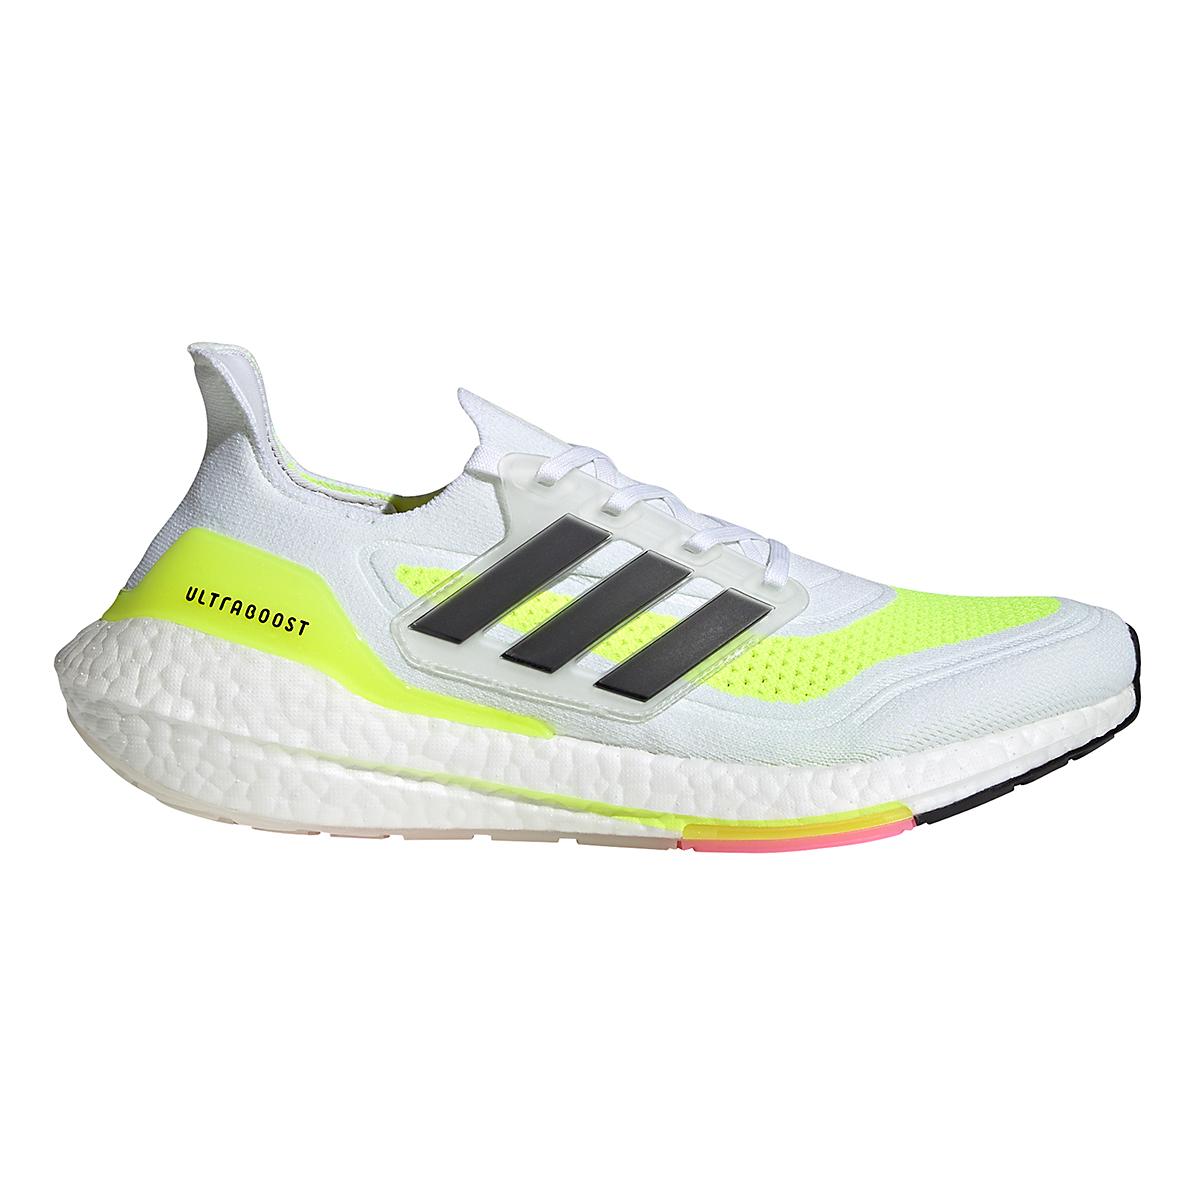 Adidas Ultraboost 21 Men's or Women's Running Shoes